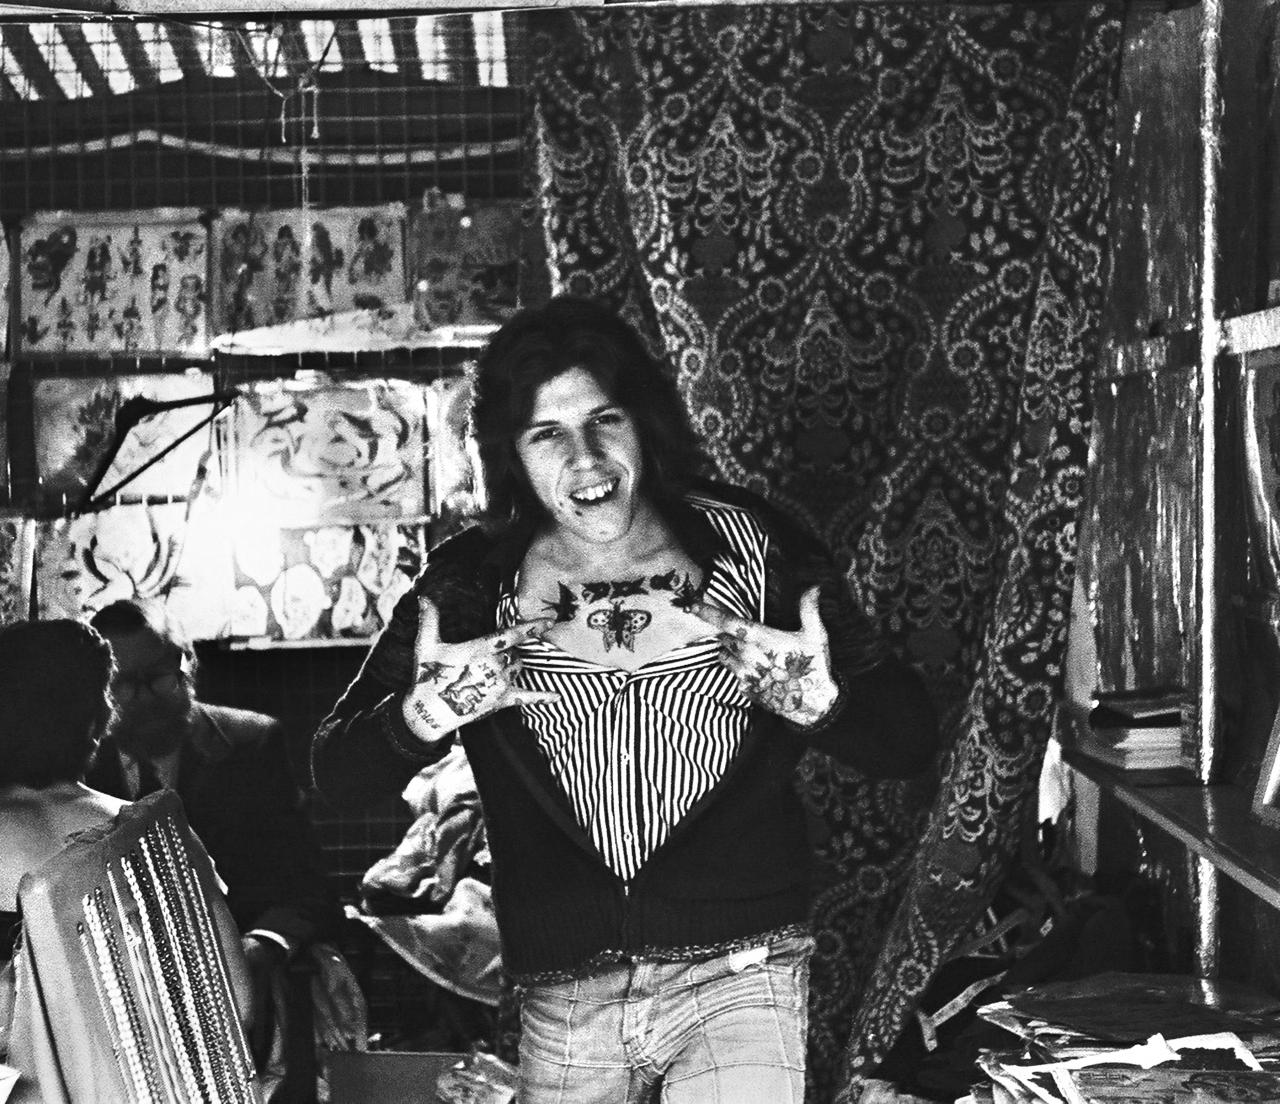 Lou Brzezinski, Tattoo Artist - Piccadilly Circus, 1976